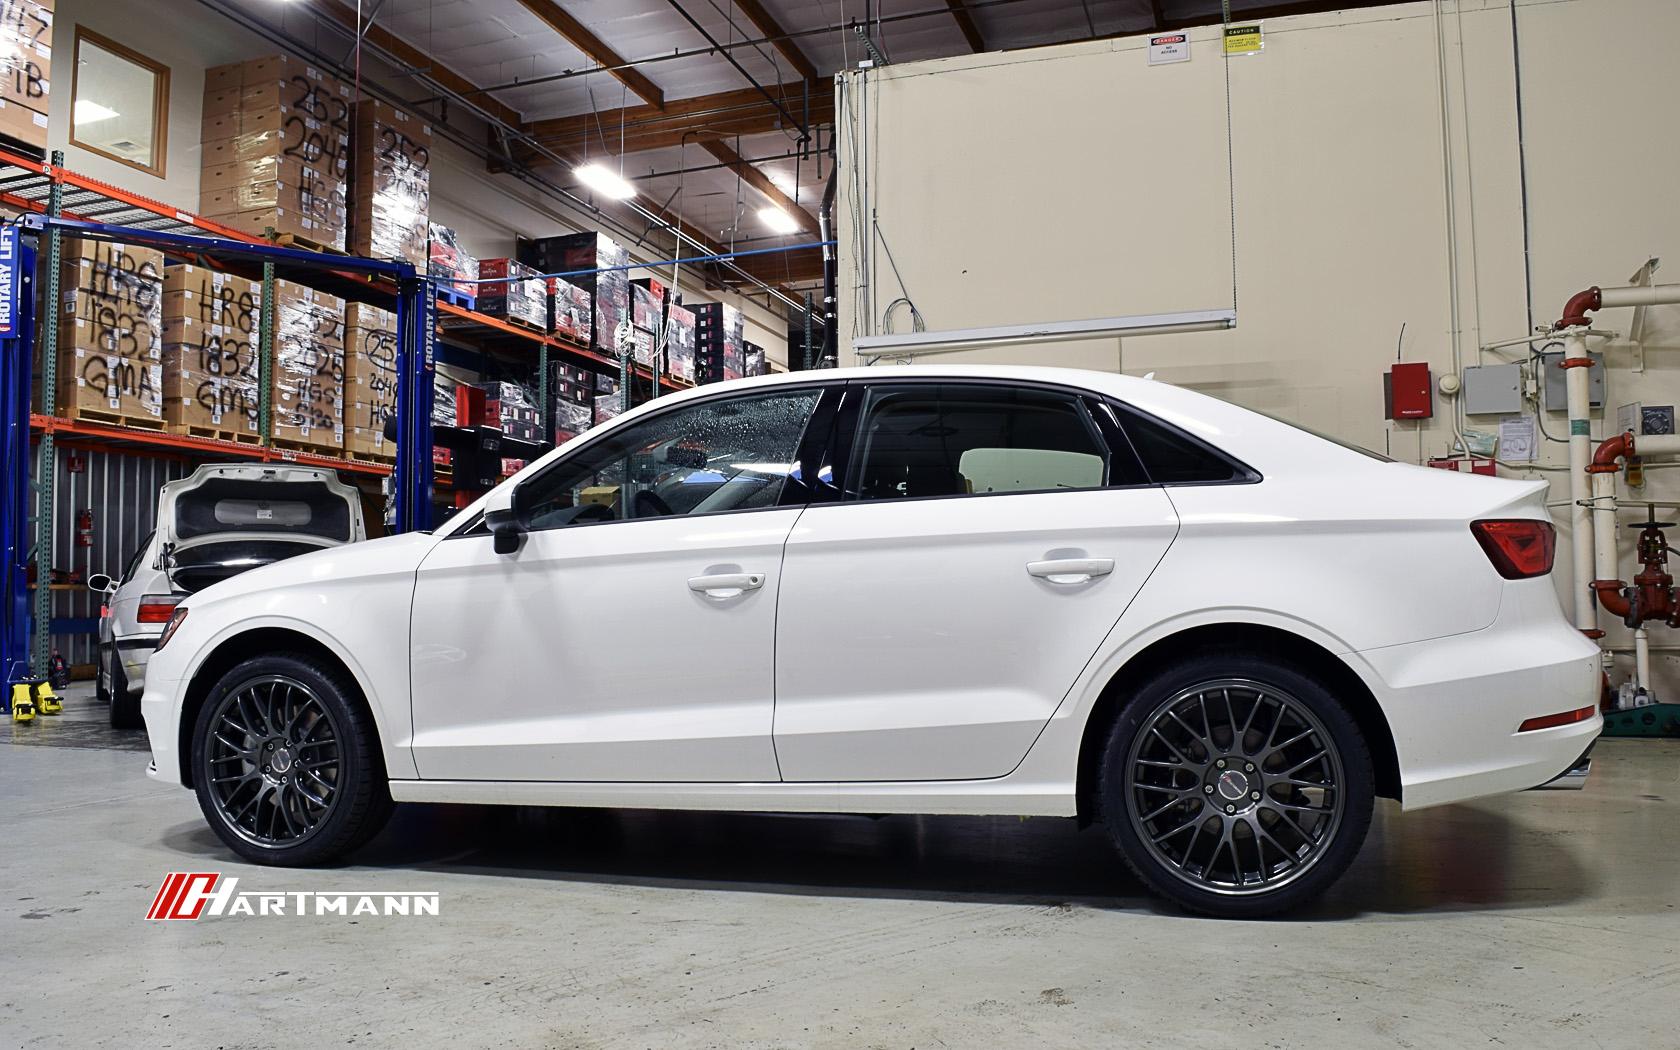 Audi 8v a3 hartmann euromesh 4 ma wheels 18 gp1 hwm